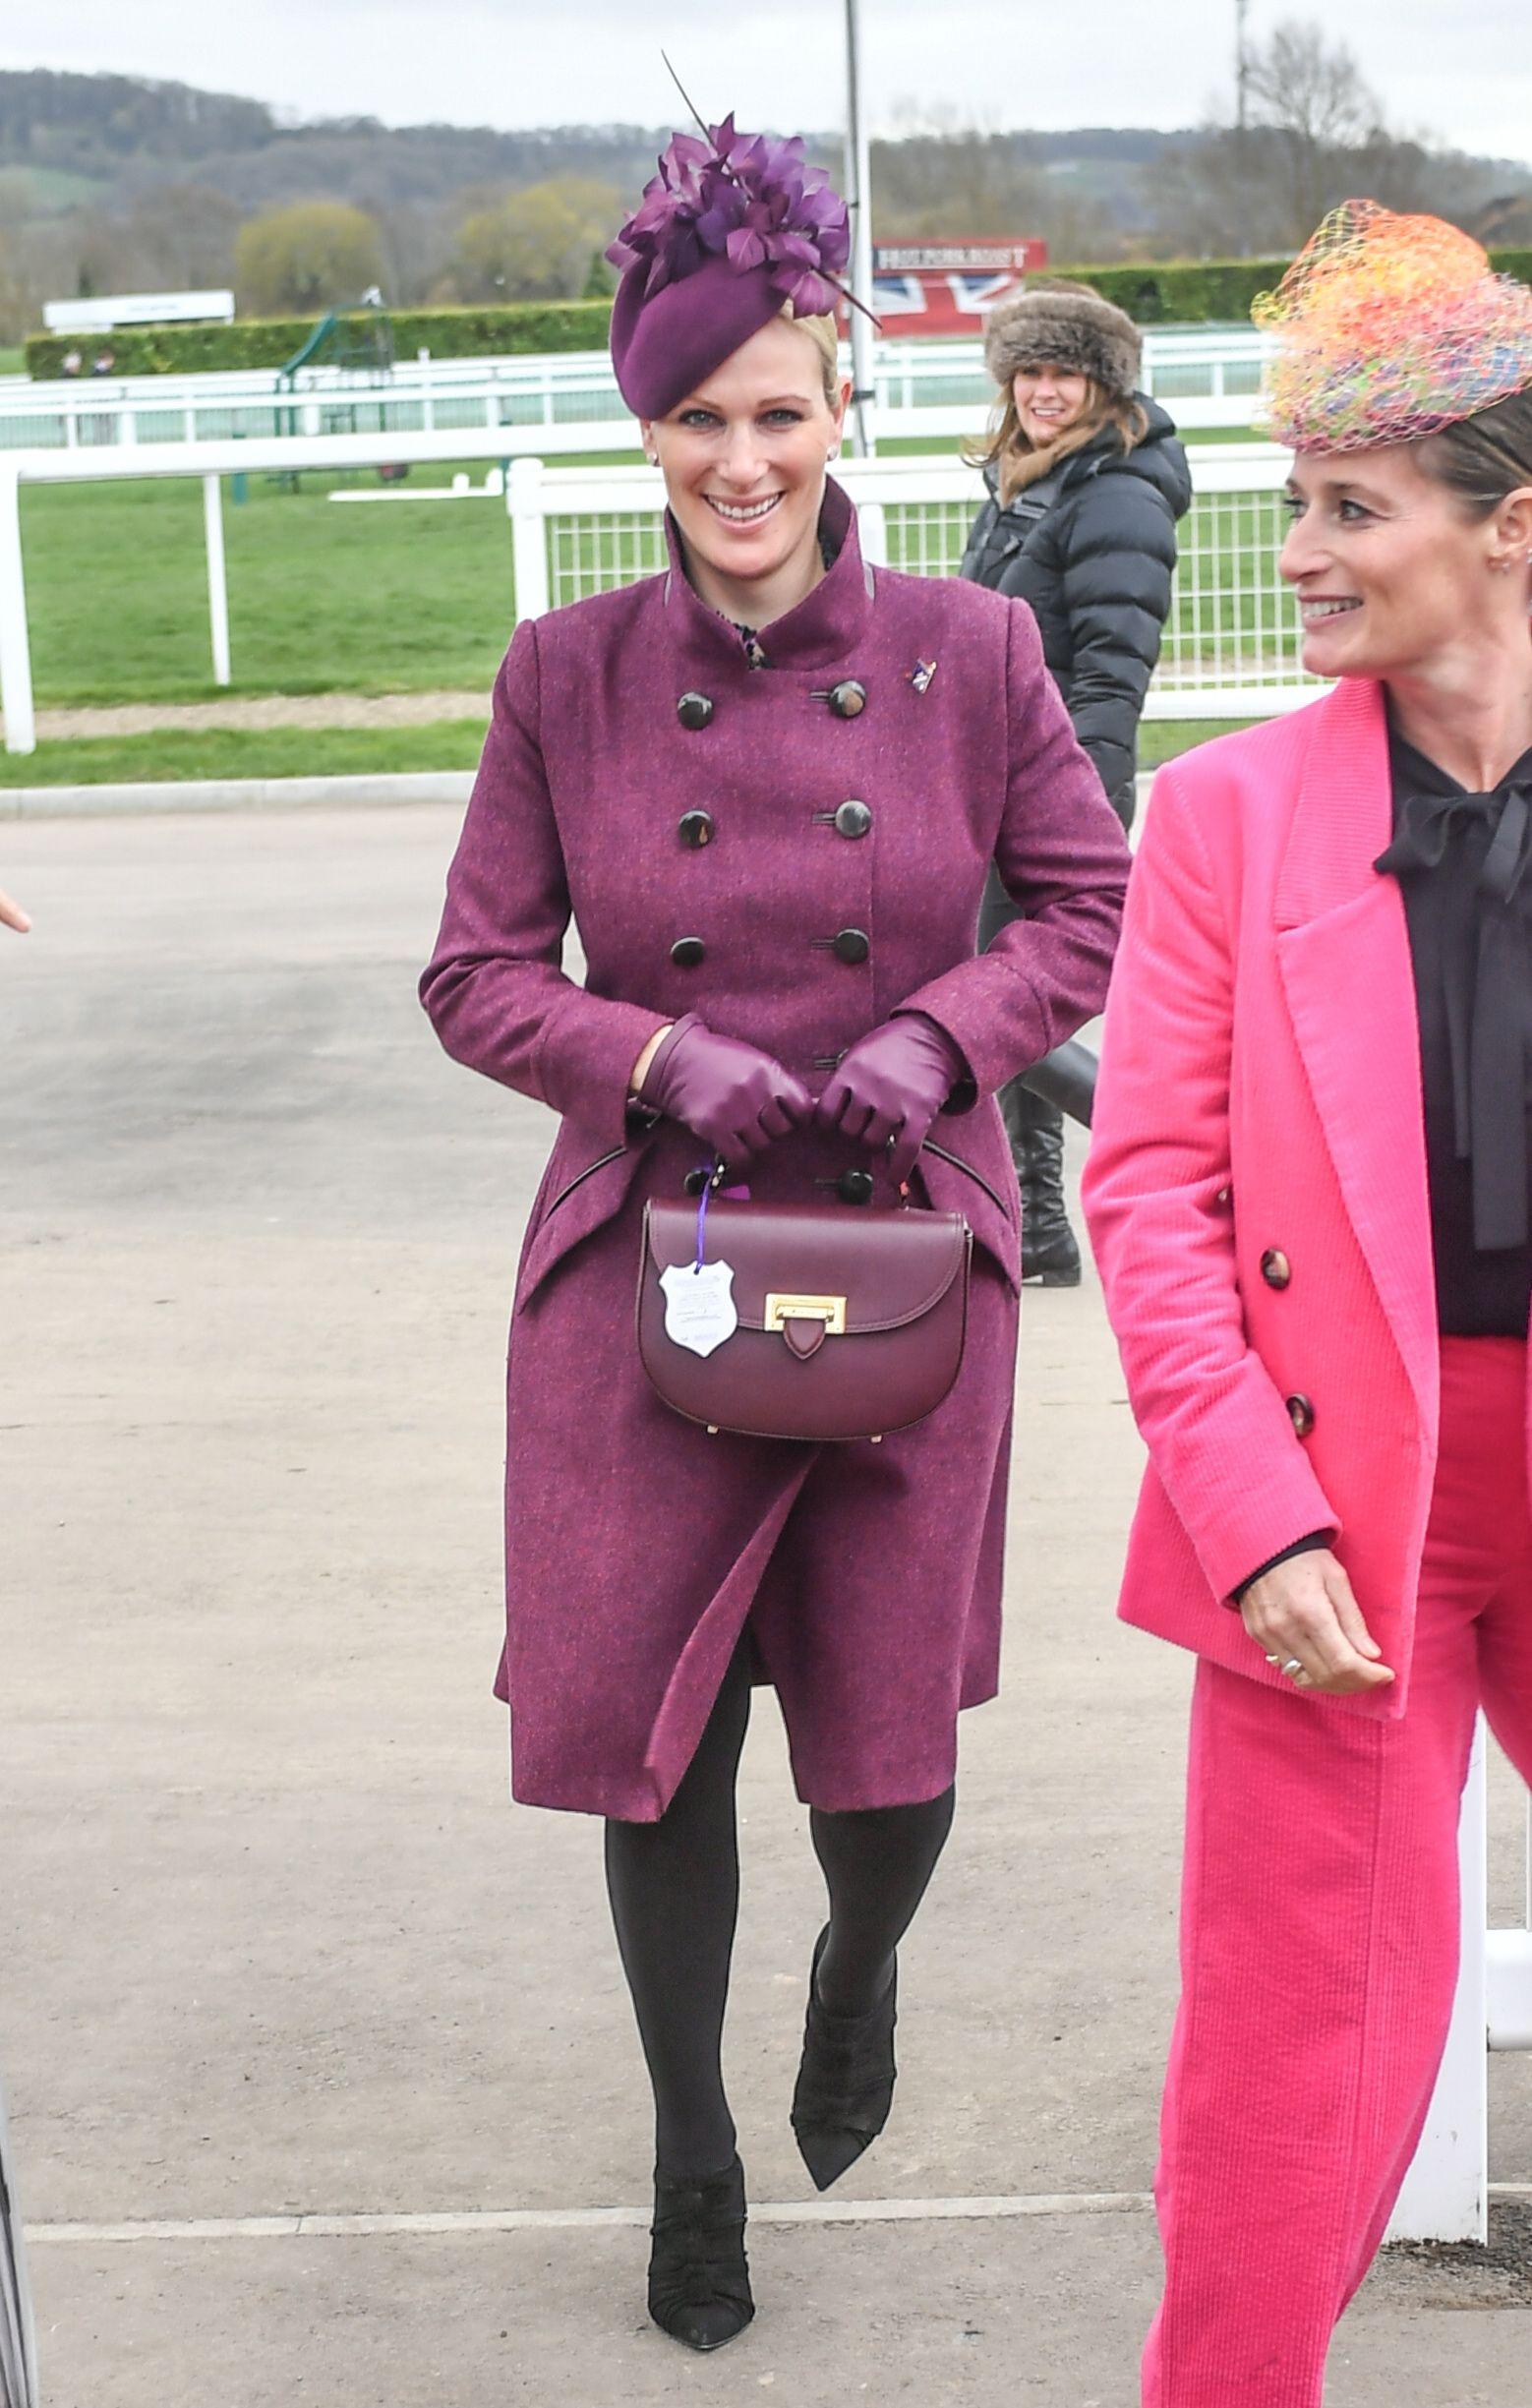 5b869fe7 Zara Tindall's Best Style Moments - Queen Elizabeth's Granddaughter Zara  Phillips Pictures